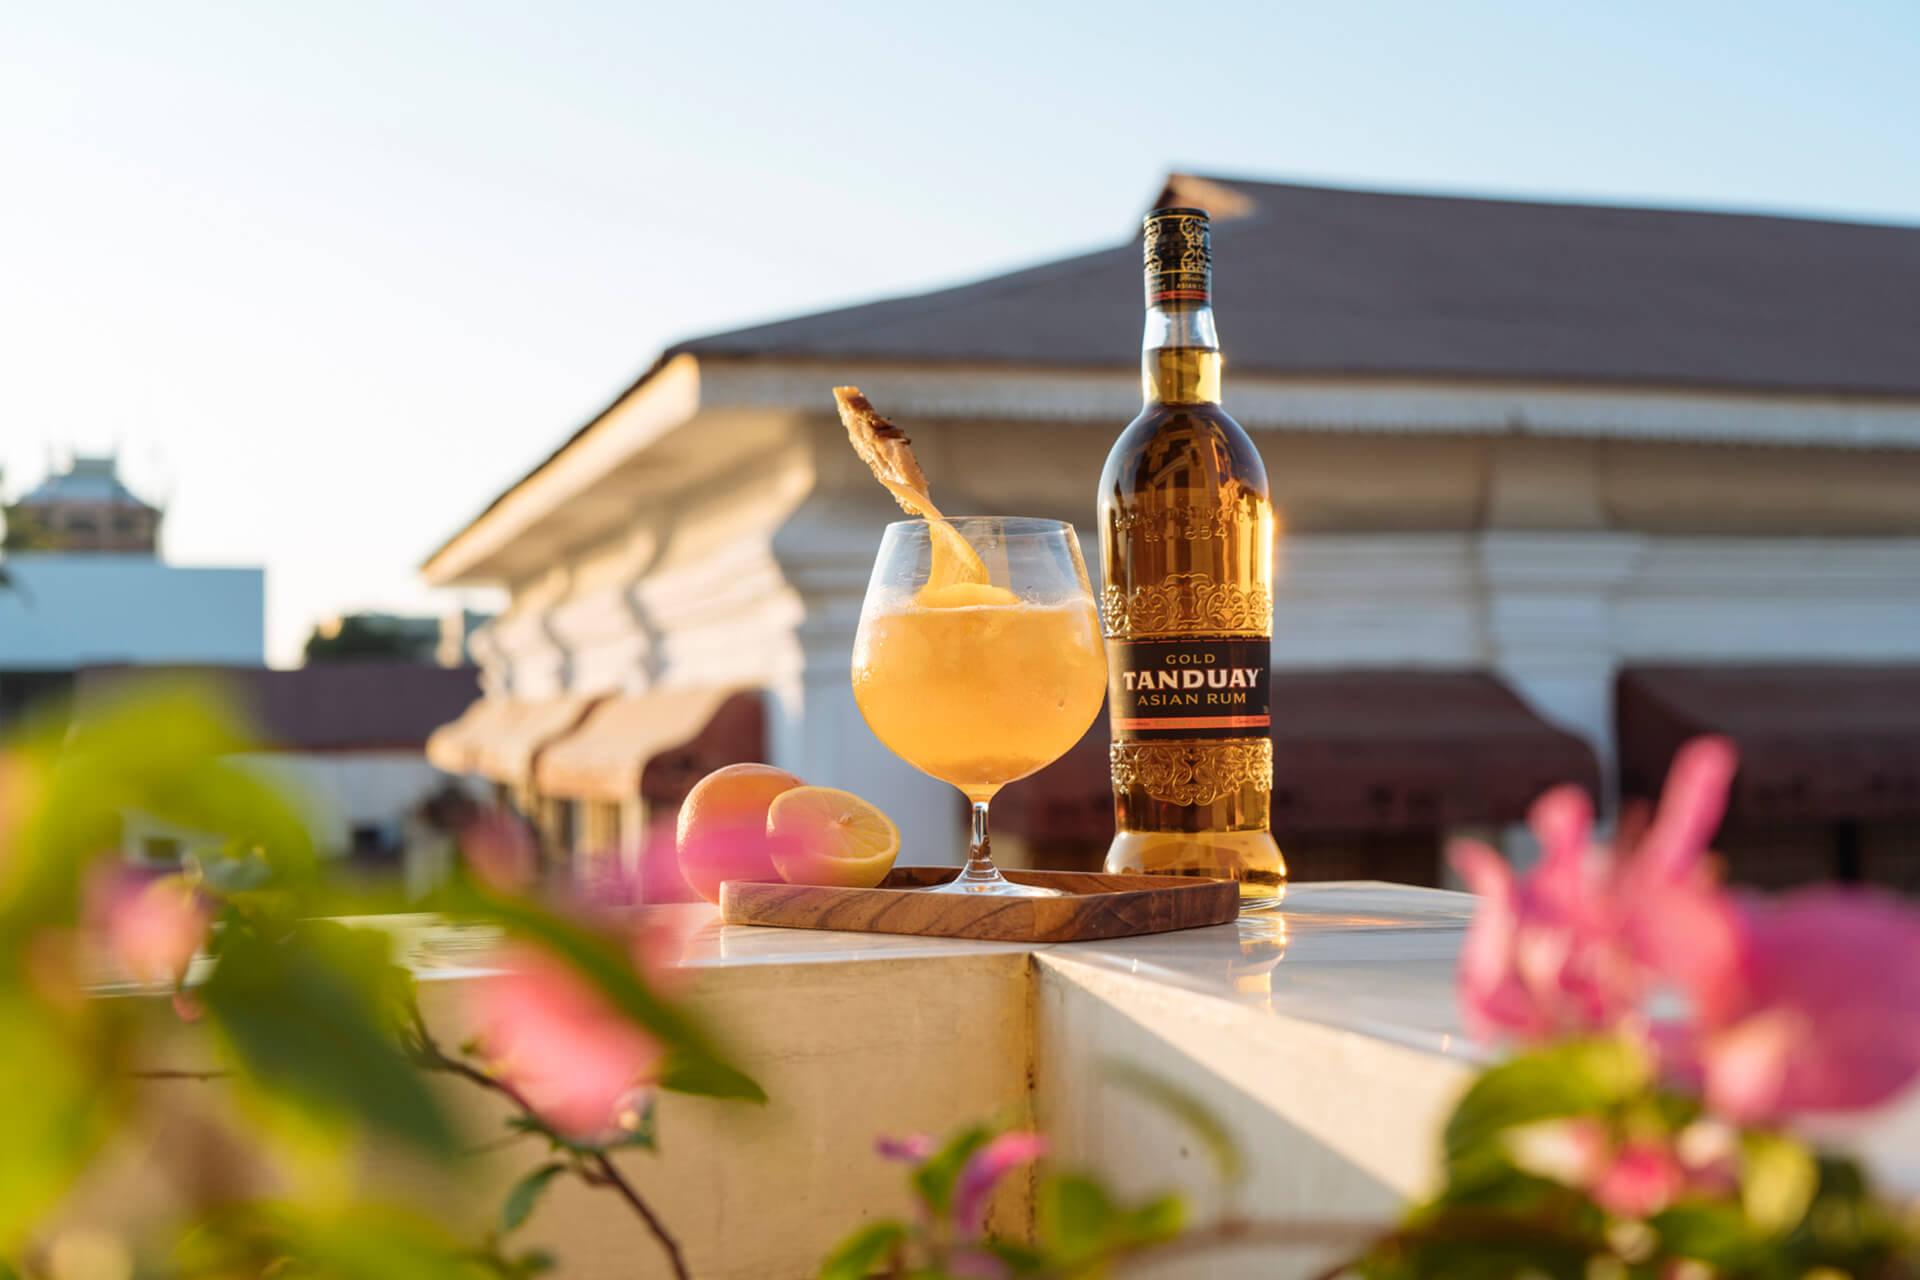 Tandauy Asian Rum with pineapple garnish on a balcony overlooking Vigan's Kalye Crisologo.